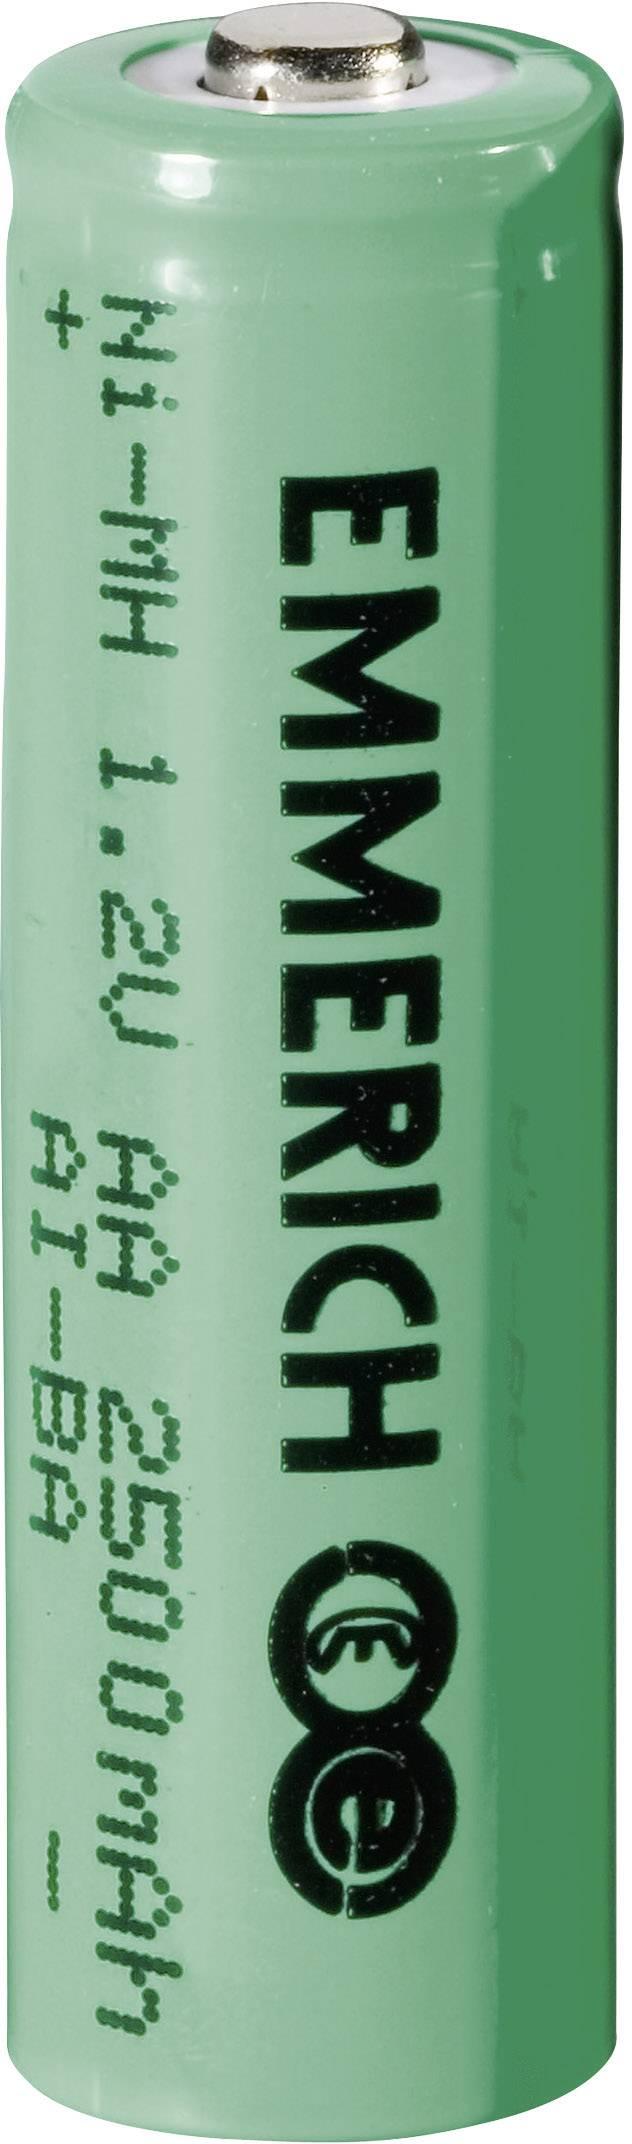 Tužkový akumulátor typu AA NiMH Emmerich HR06 255028, 2500 mAh, 1.2 V, 1 ks